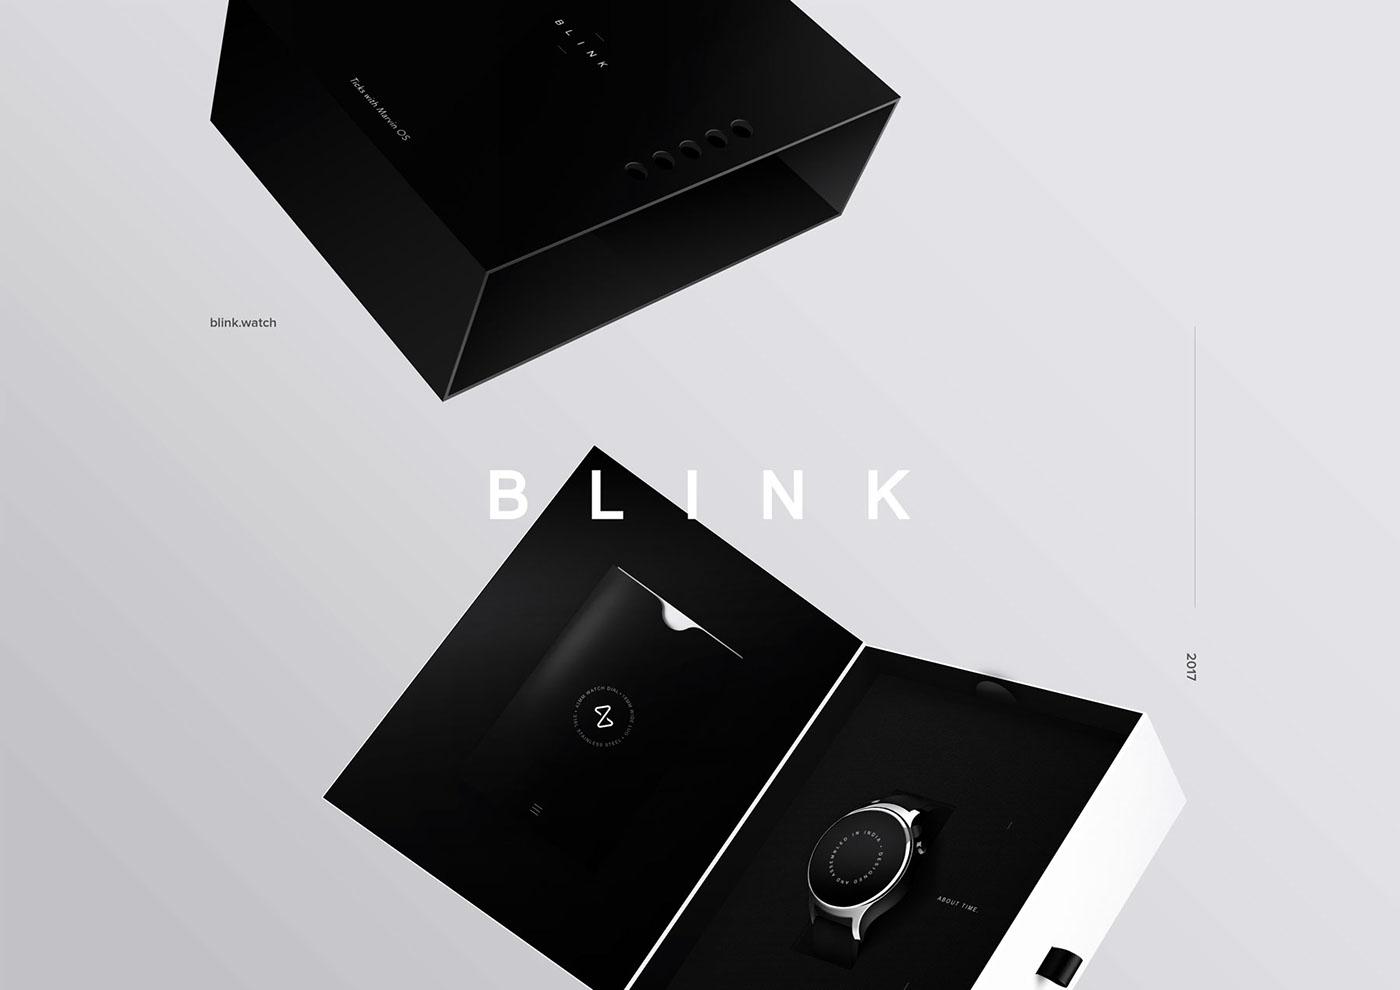 Packaging branding  blink smartwatch Experience watch adobeawards witworks